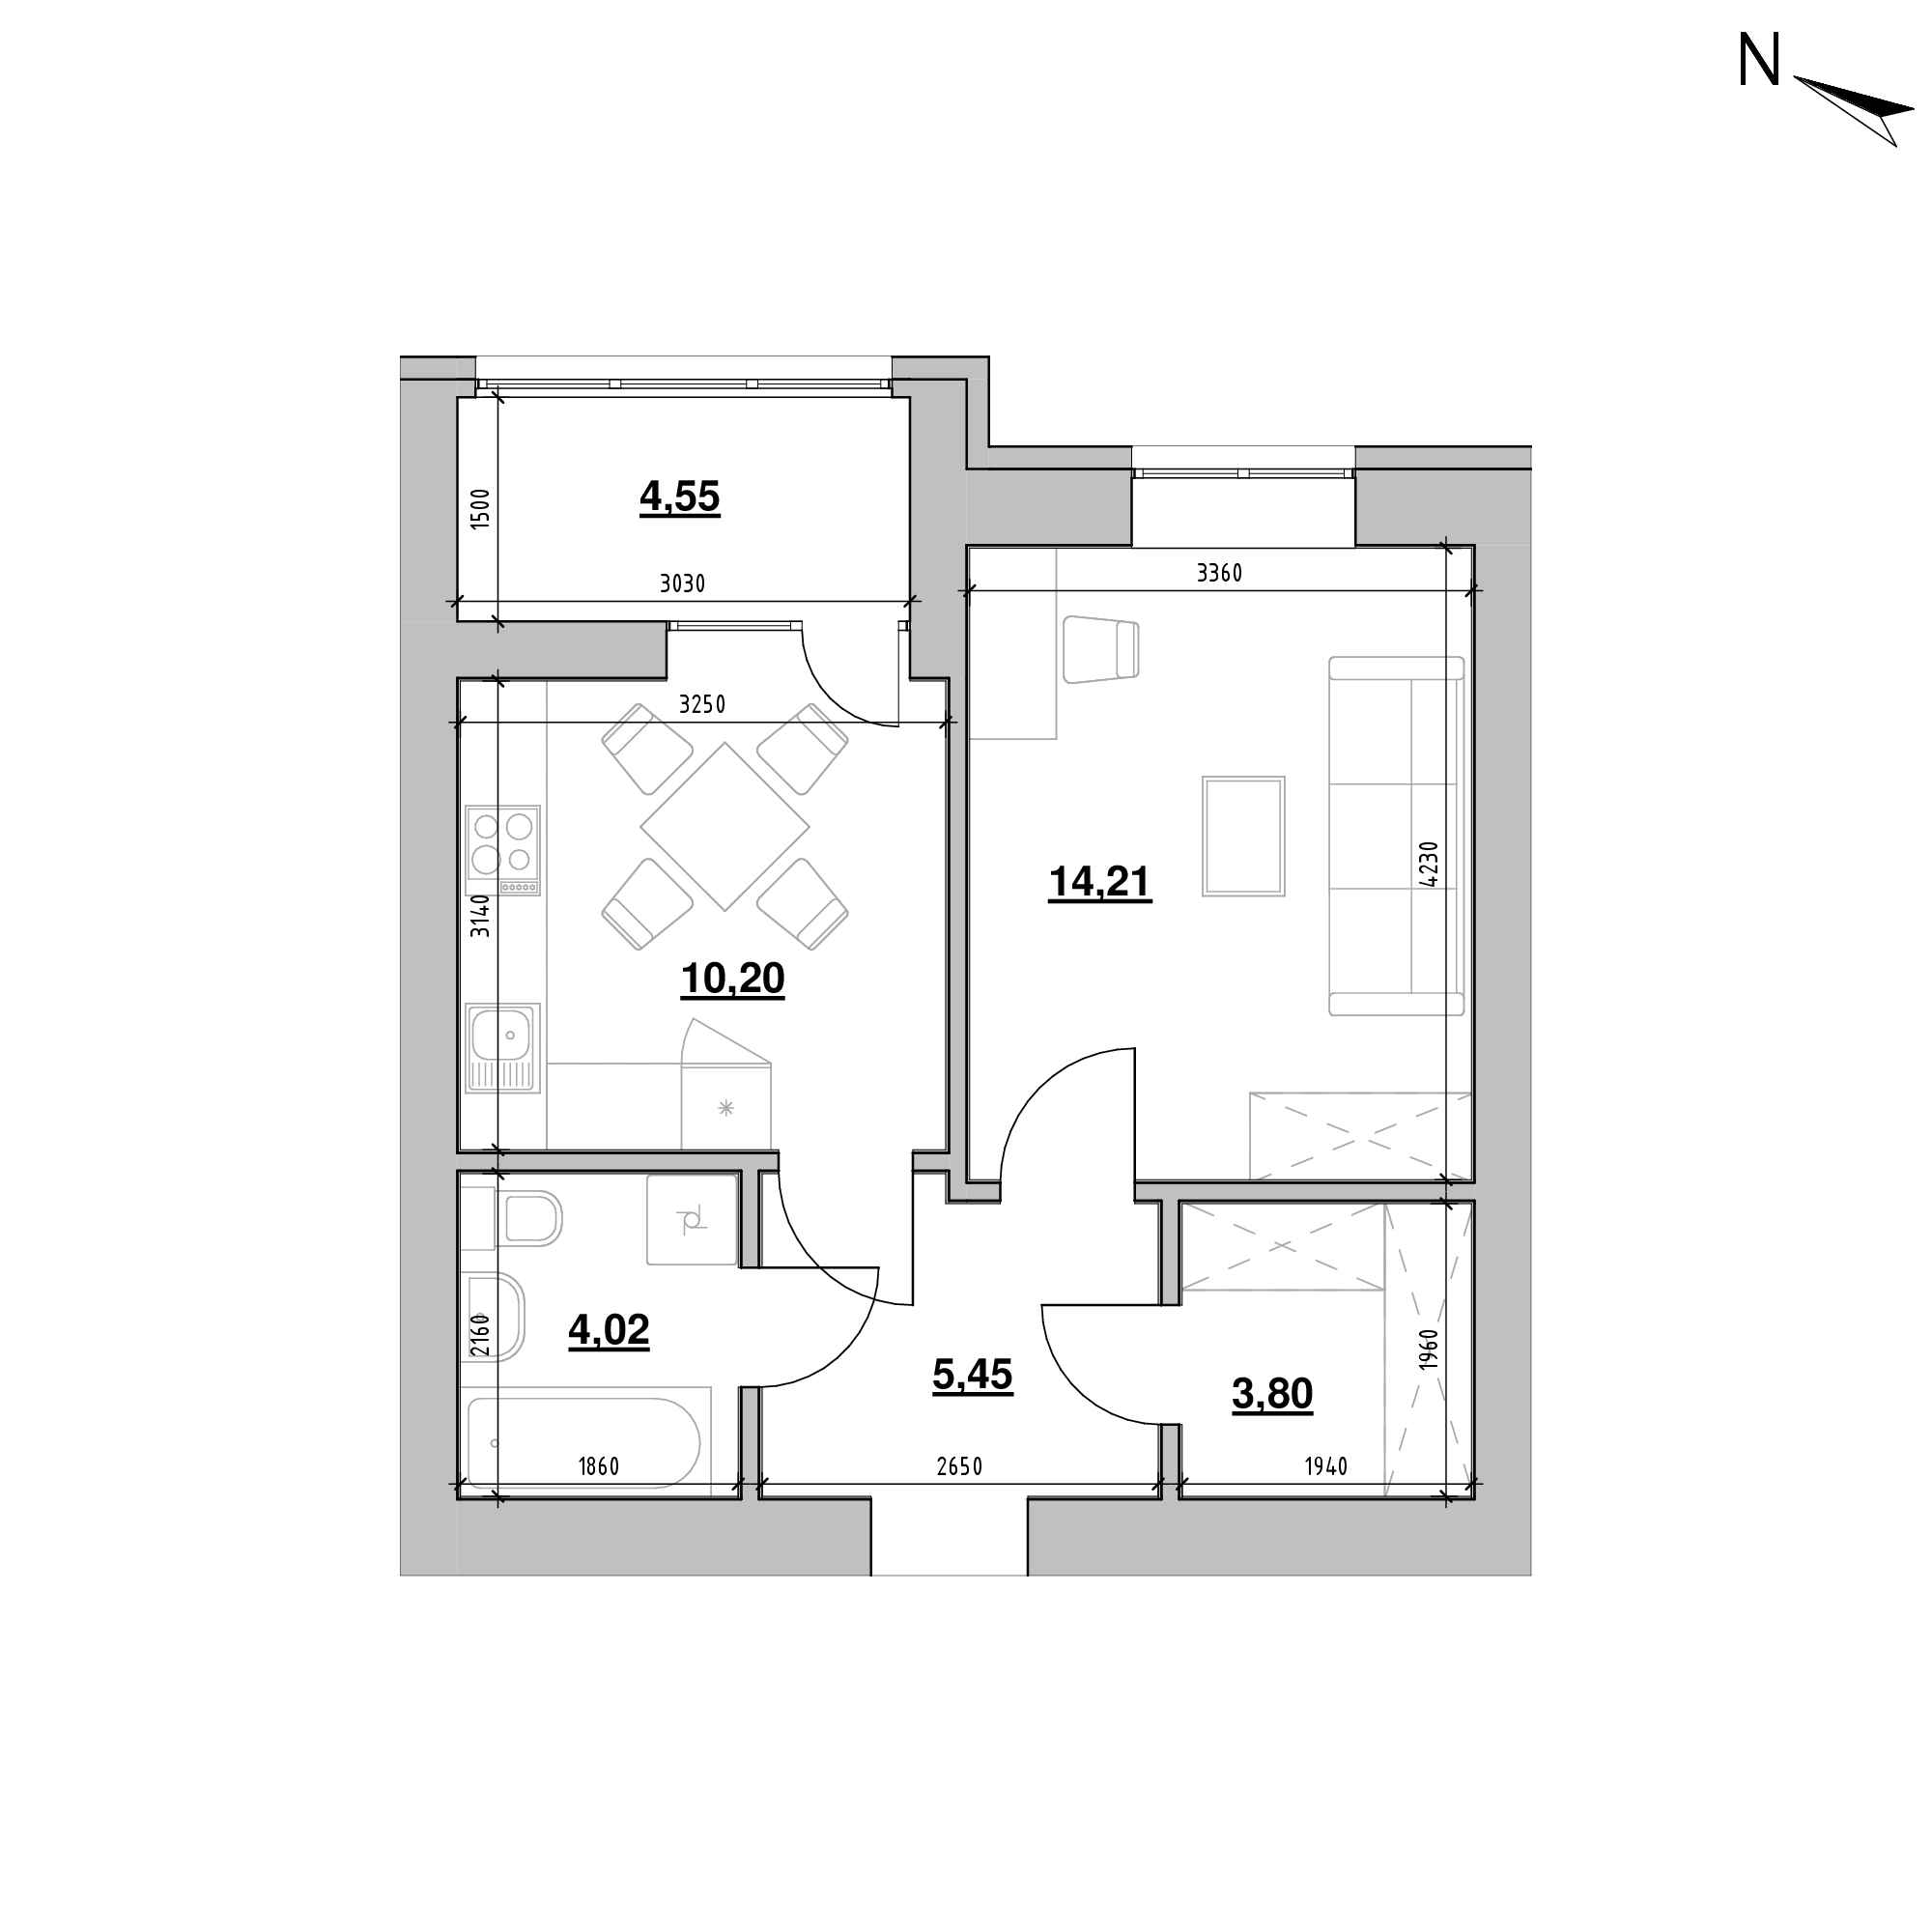 ЖК Шенген: планування 1-кімнатної квартири, №19, 42.23 м<sup>2</sup>